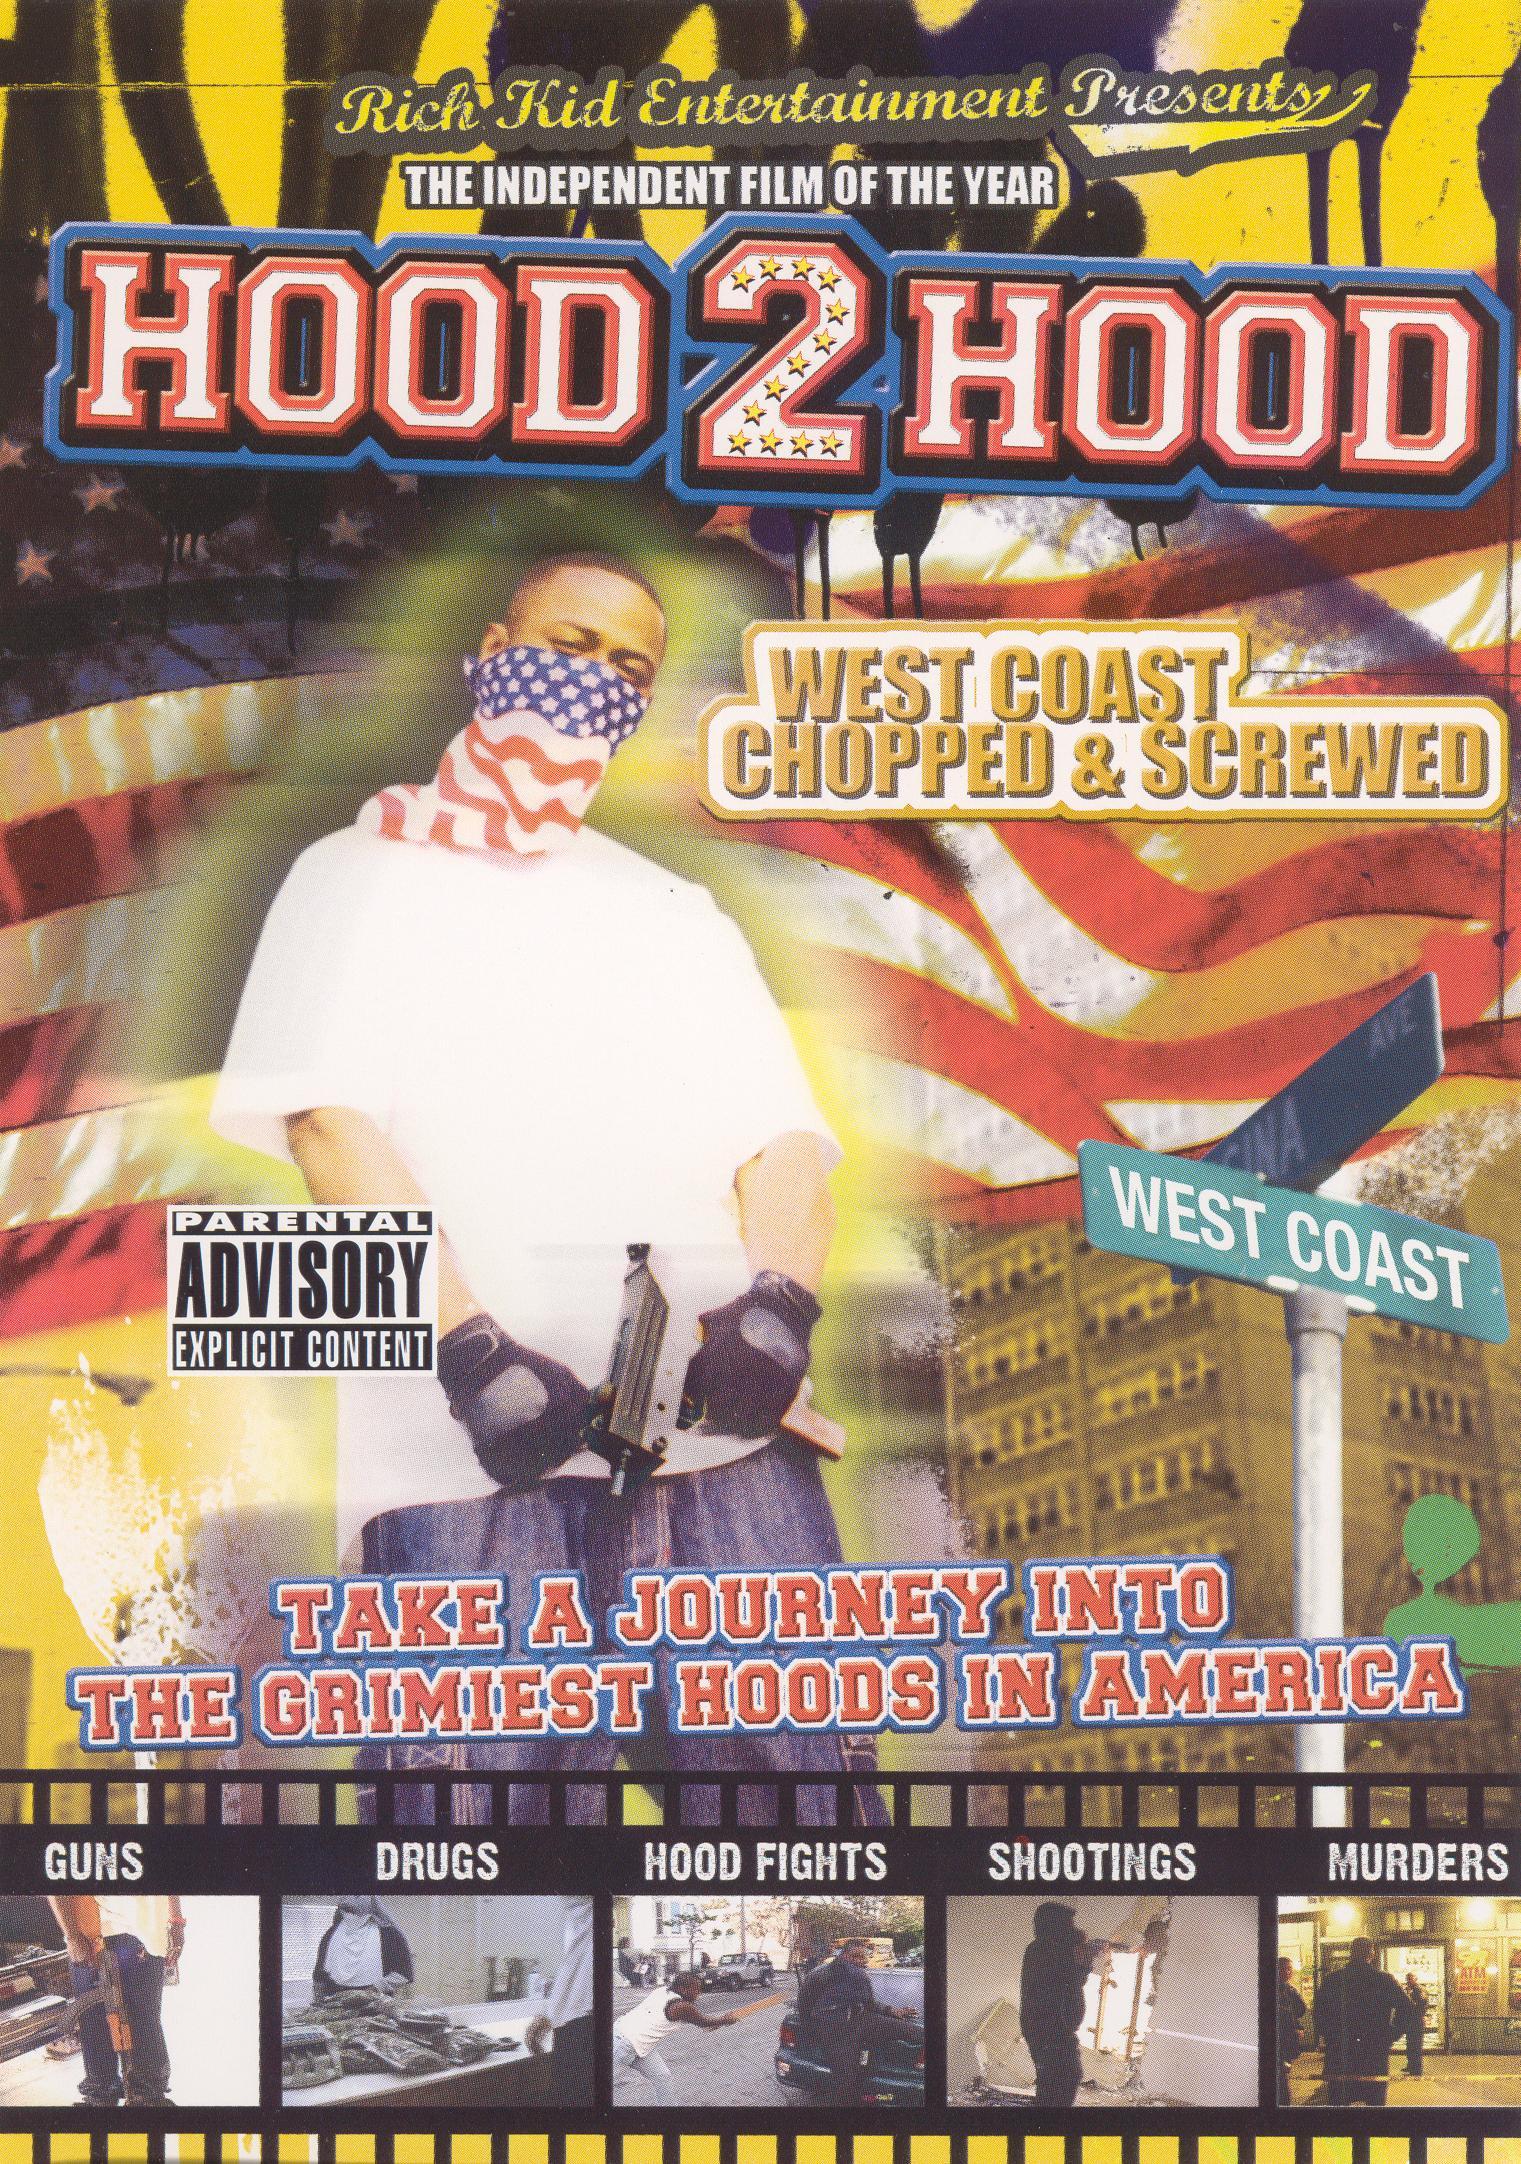 Hood 2 Hood: West Coast